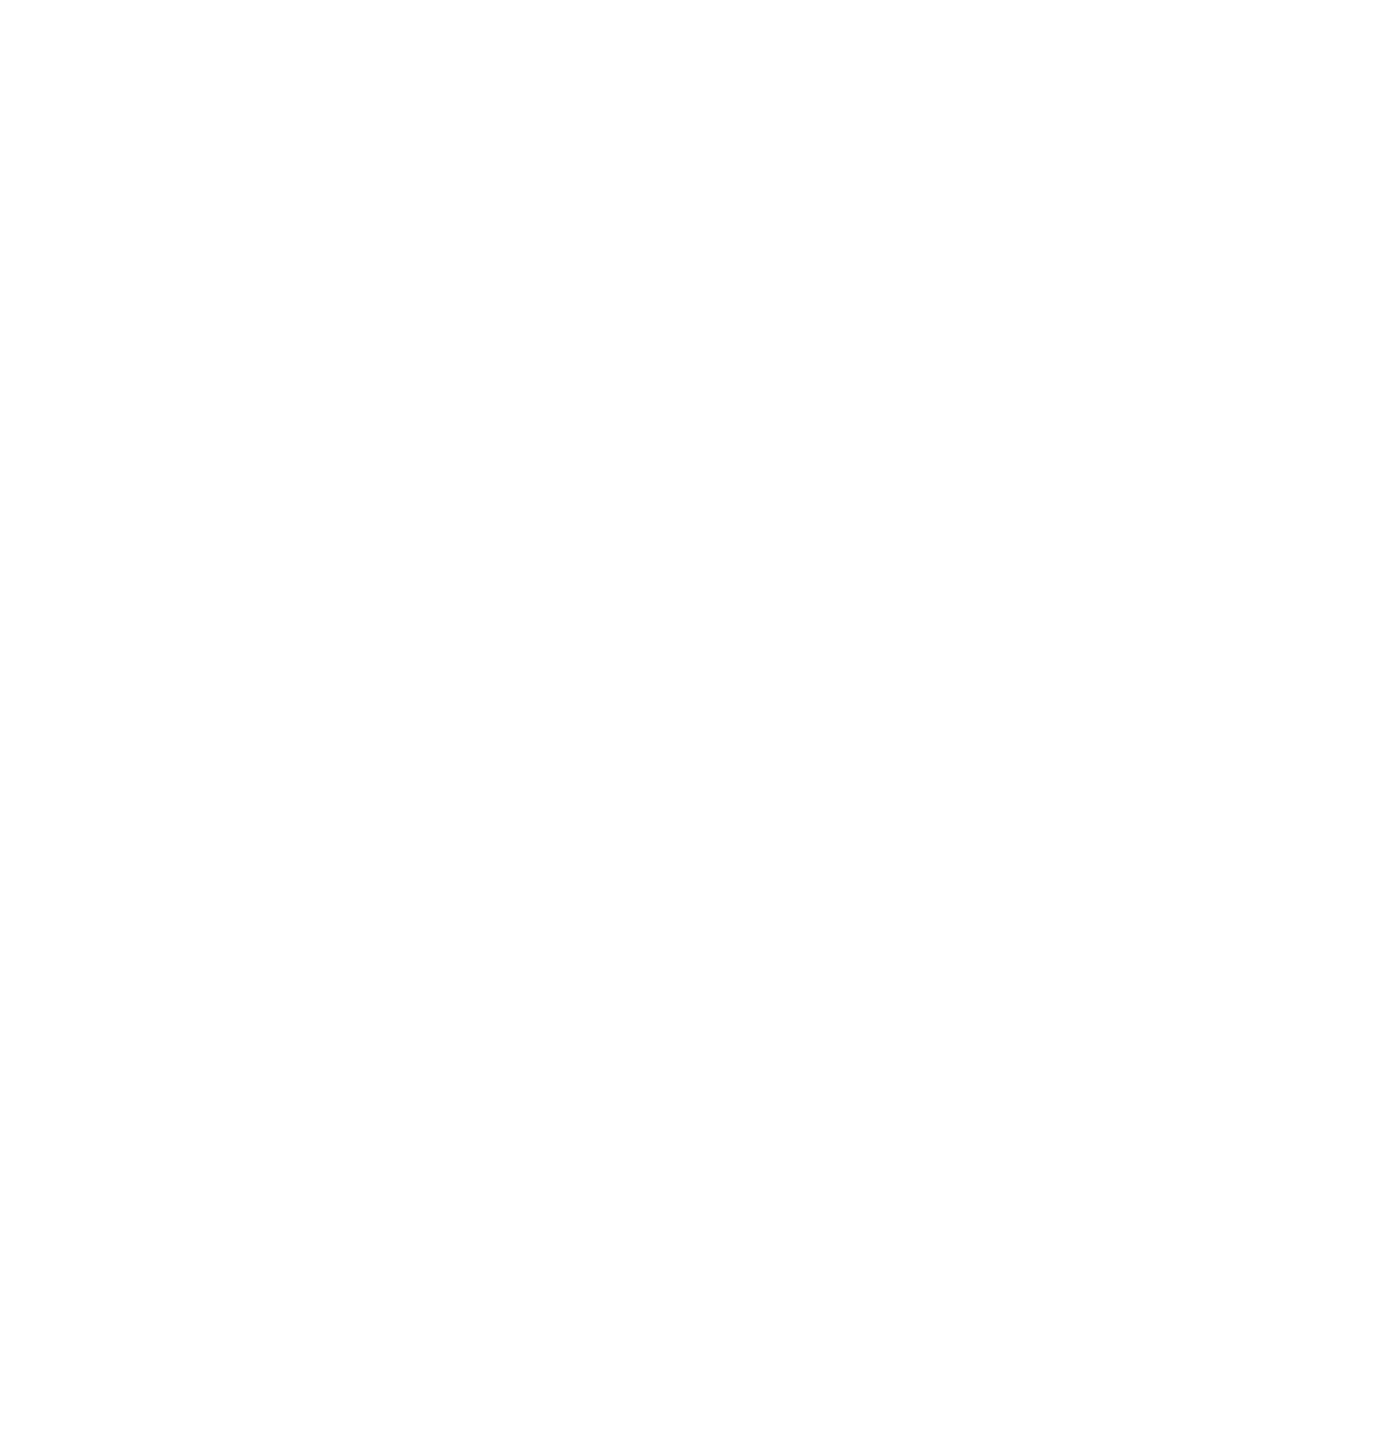 Europaportens skola